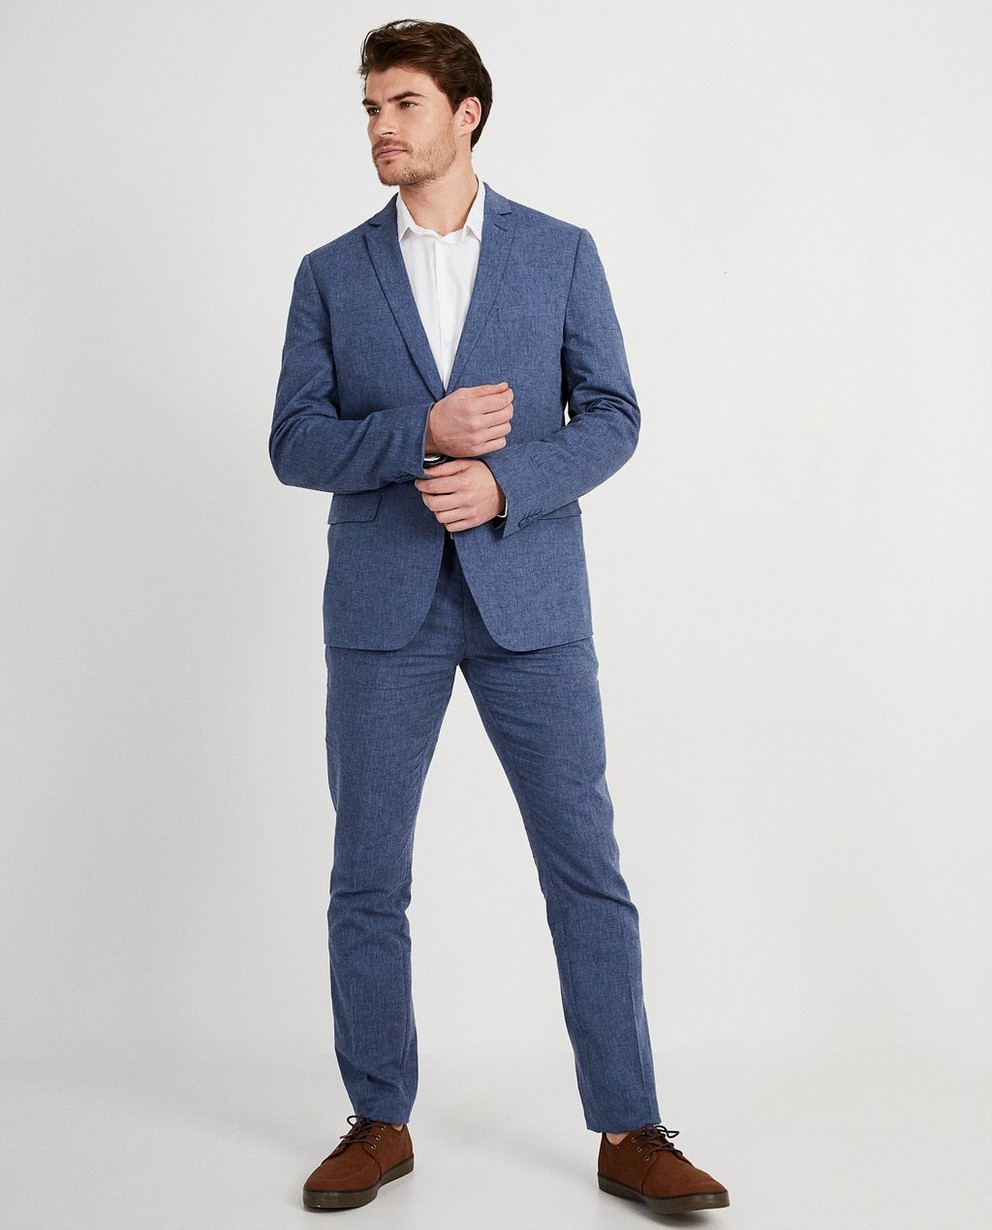 Geklede blauwe kostuumbroek  - bevat linnen - JBC NL